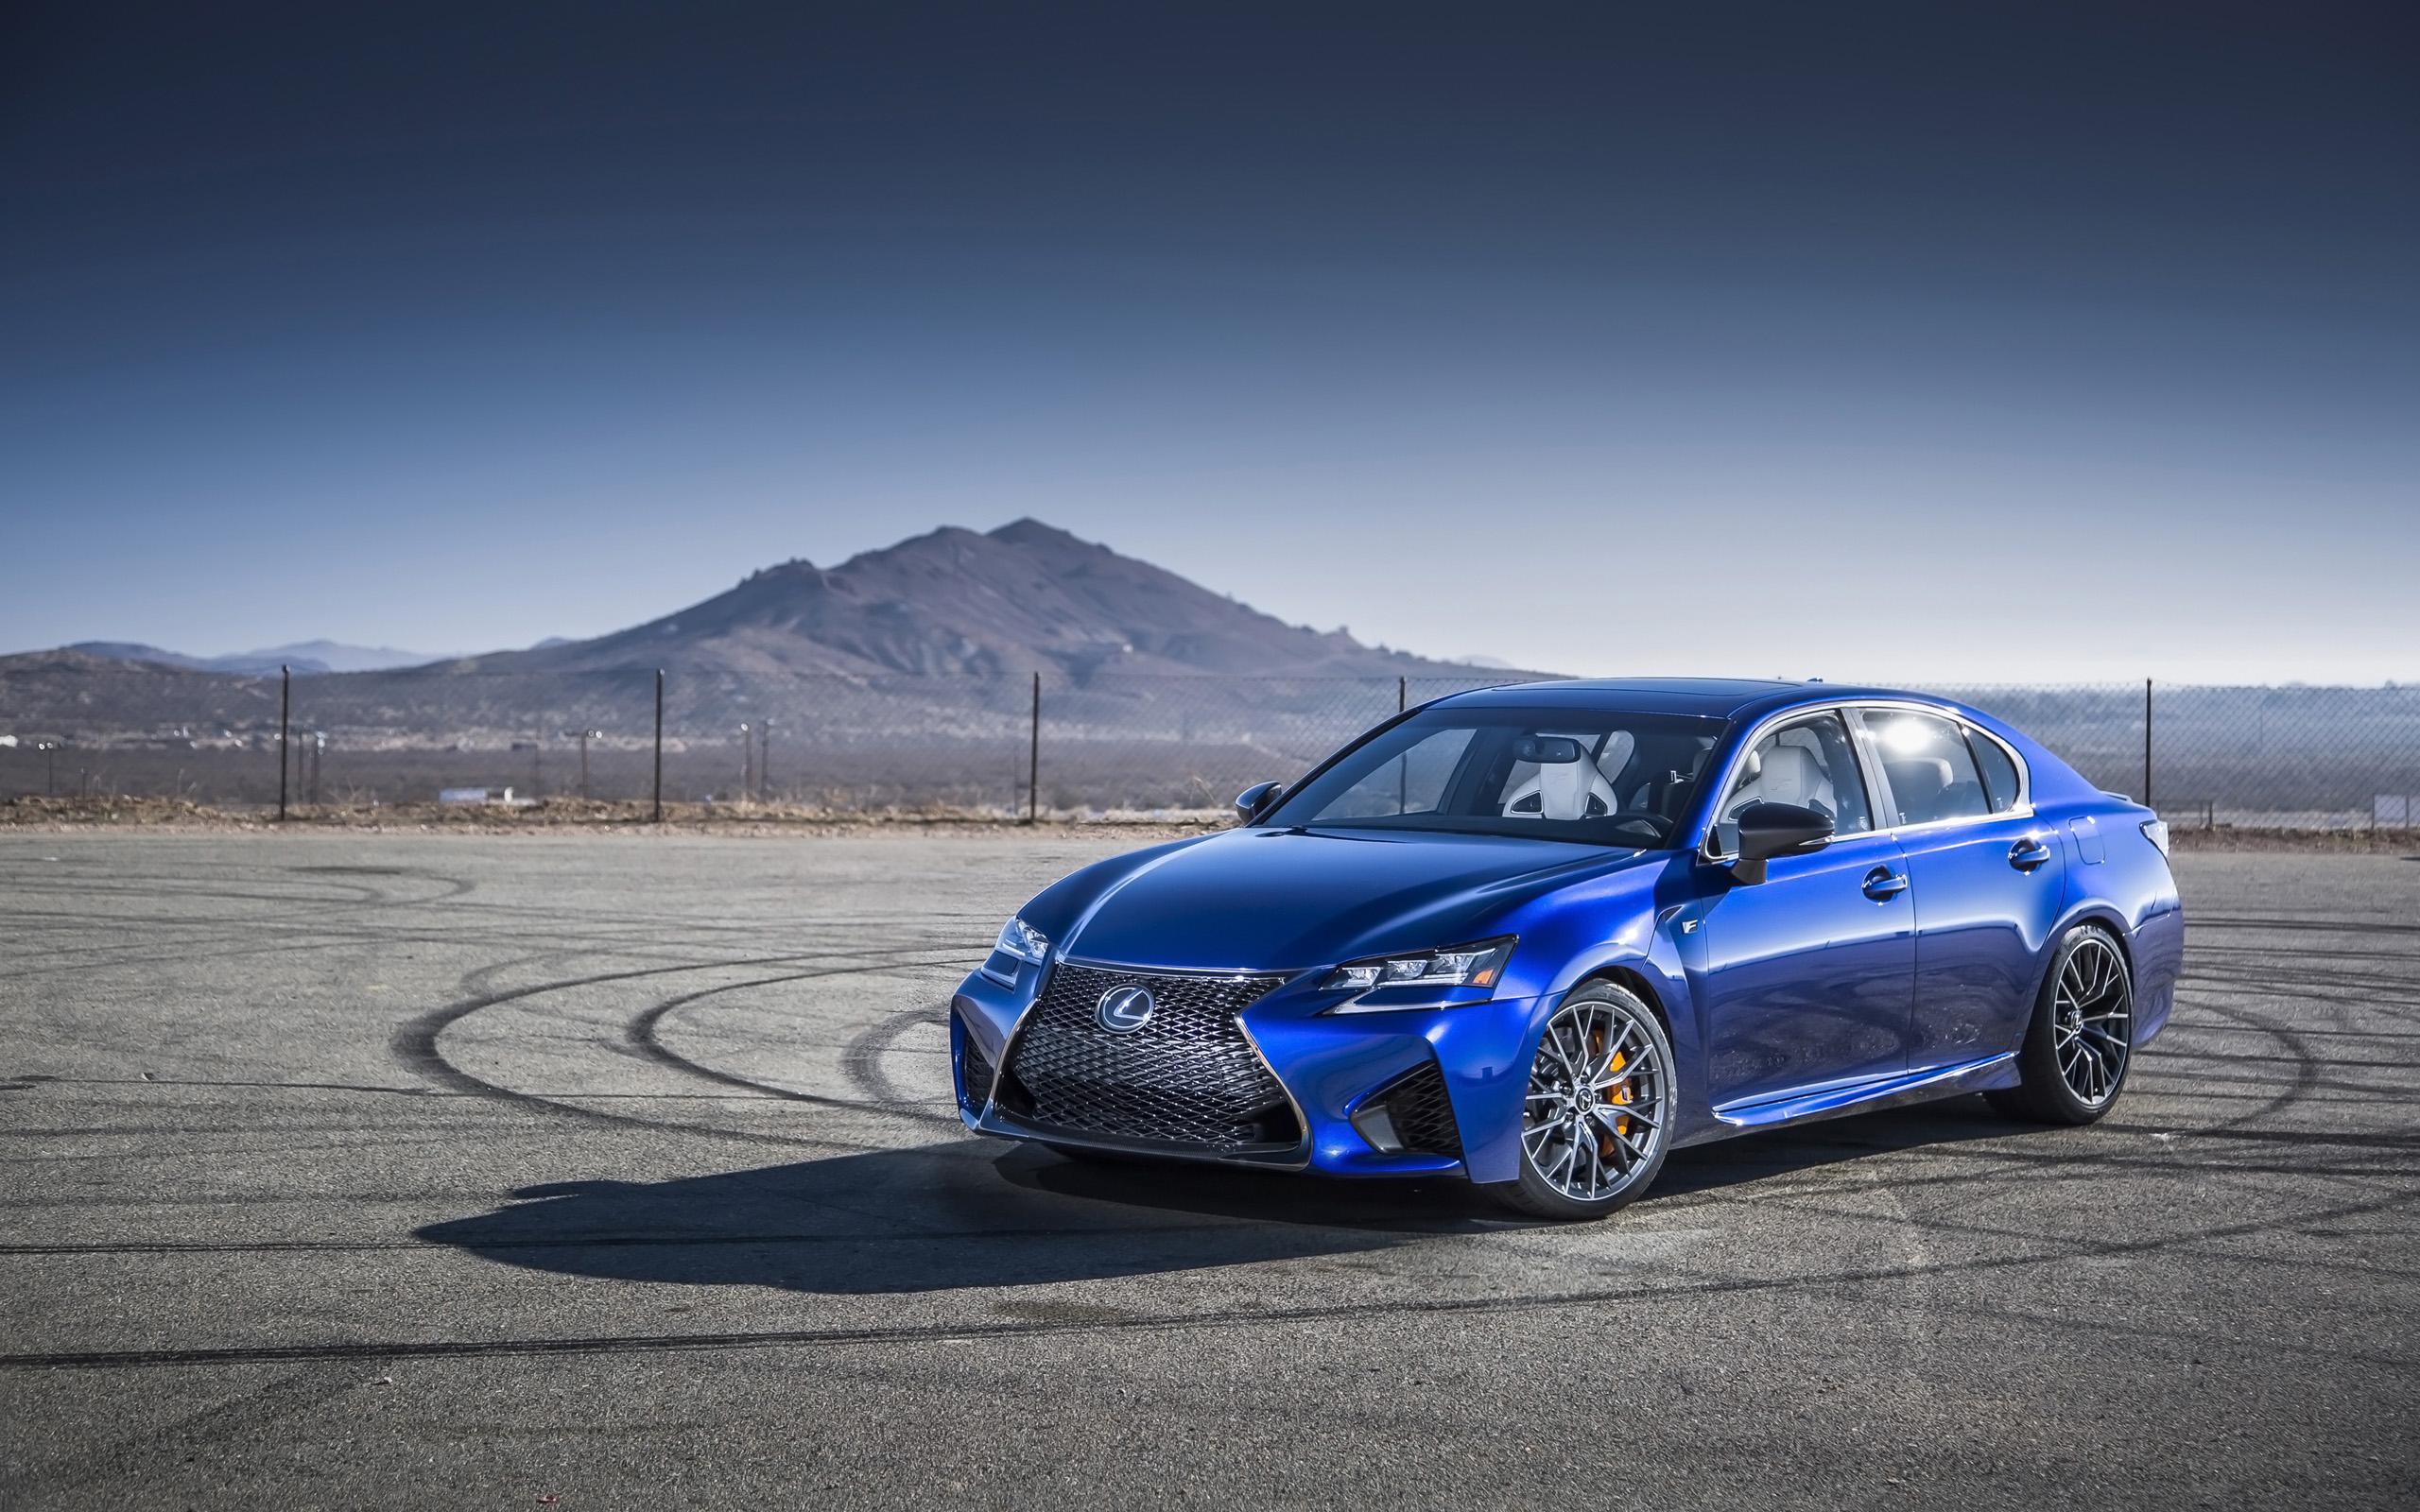 2016 Lexus GS F Wallpaper HD Car Wallpapers 2560x1600